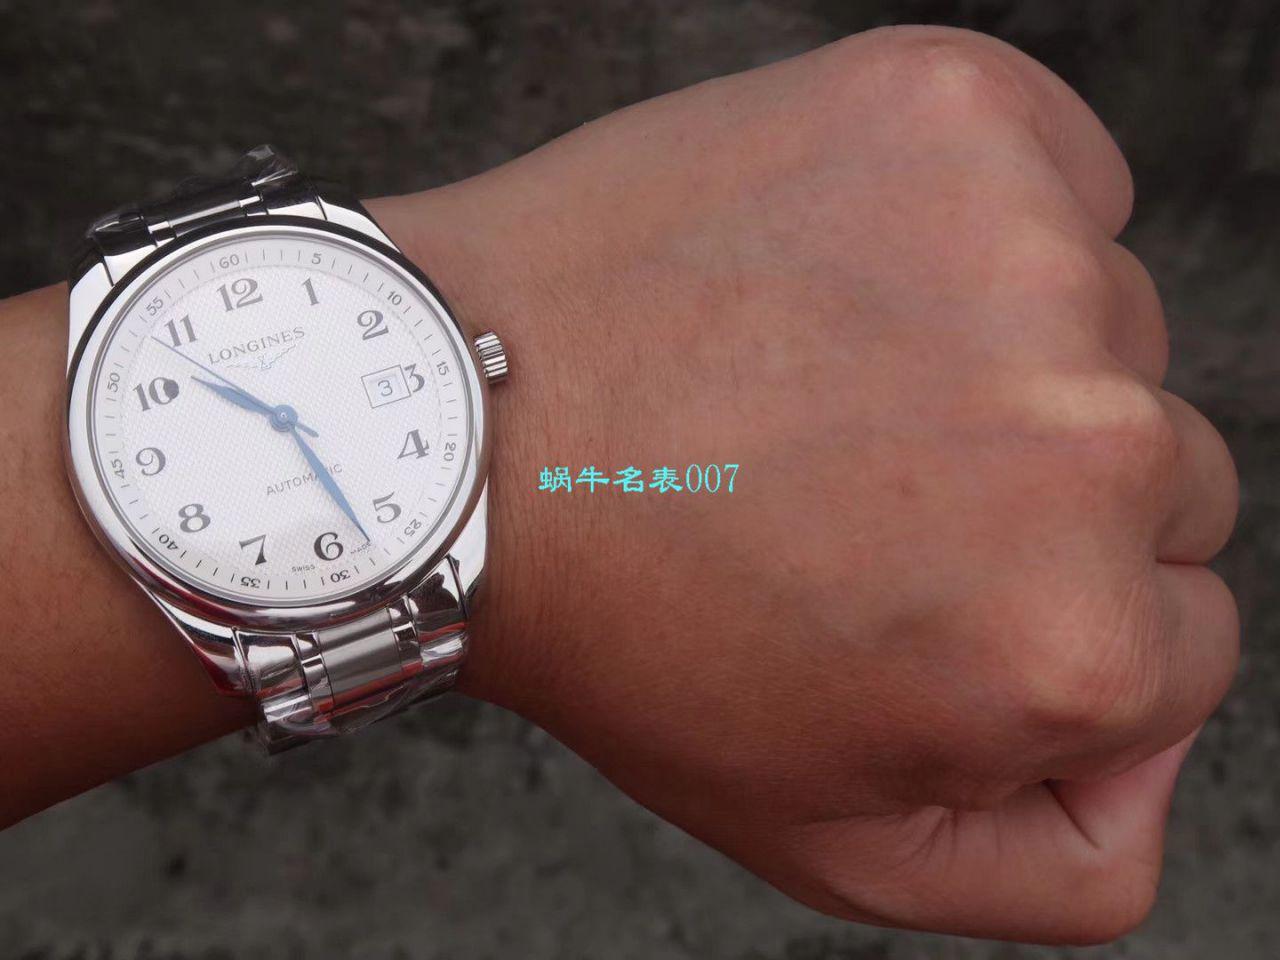 【V9厂名匠三针新款40mm三字位日历款顶级副本】浪琴名匠系列L2.793.4.97.6腕表